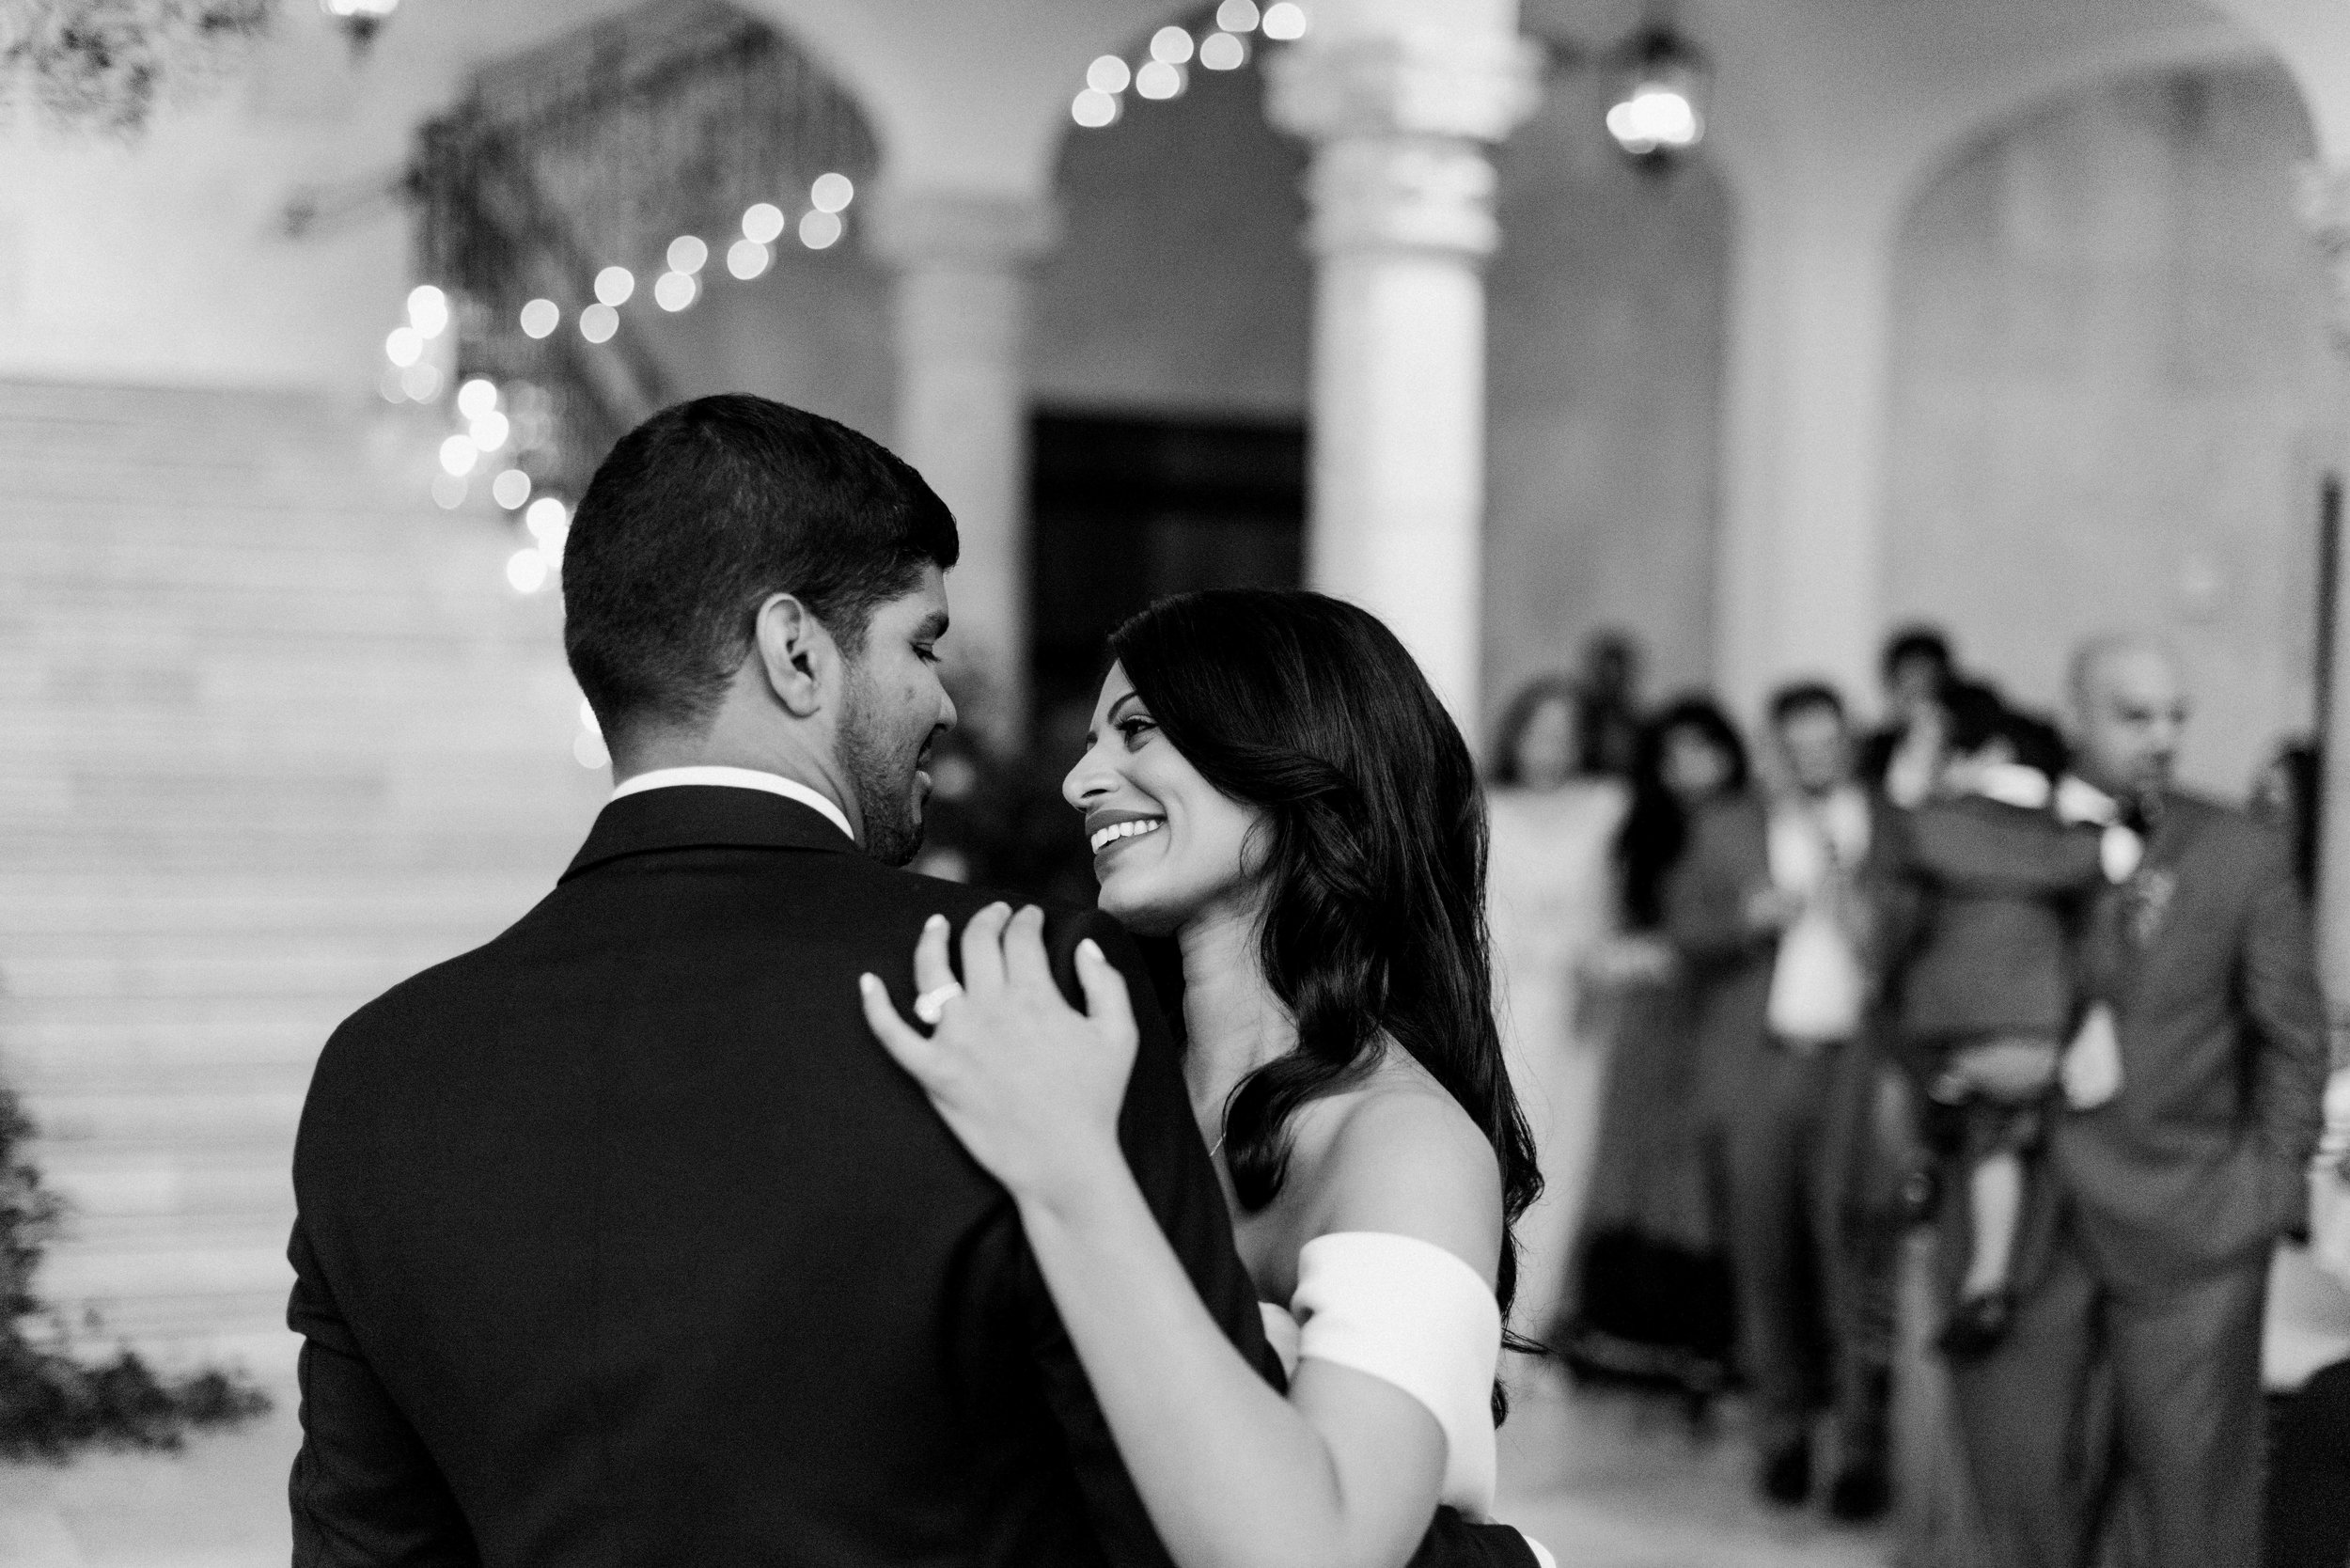 Fine-Art-Film-Houston-Wedding-Photographer-Best-Top-Luxury-Texas-Austin-Dallas-Destination-Dana-Fernandez-Photography-The-Bell-Tower-on-34th-Indian-32.jpg